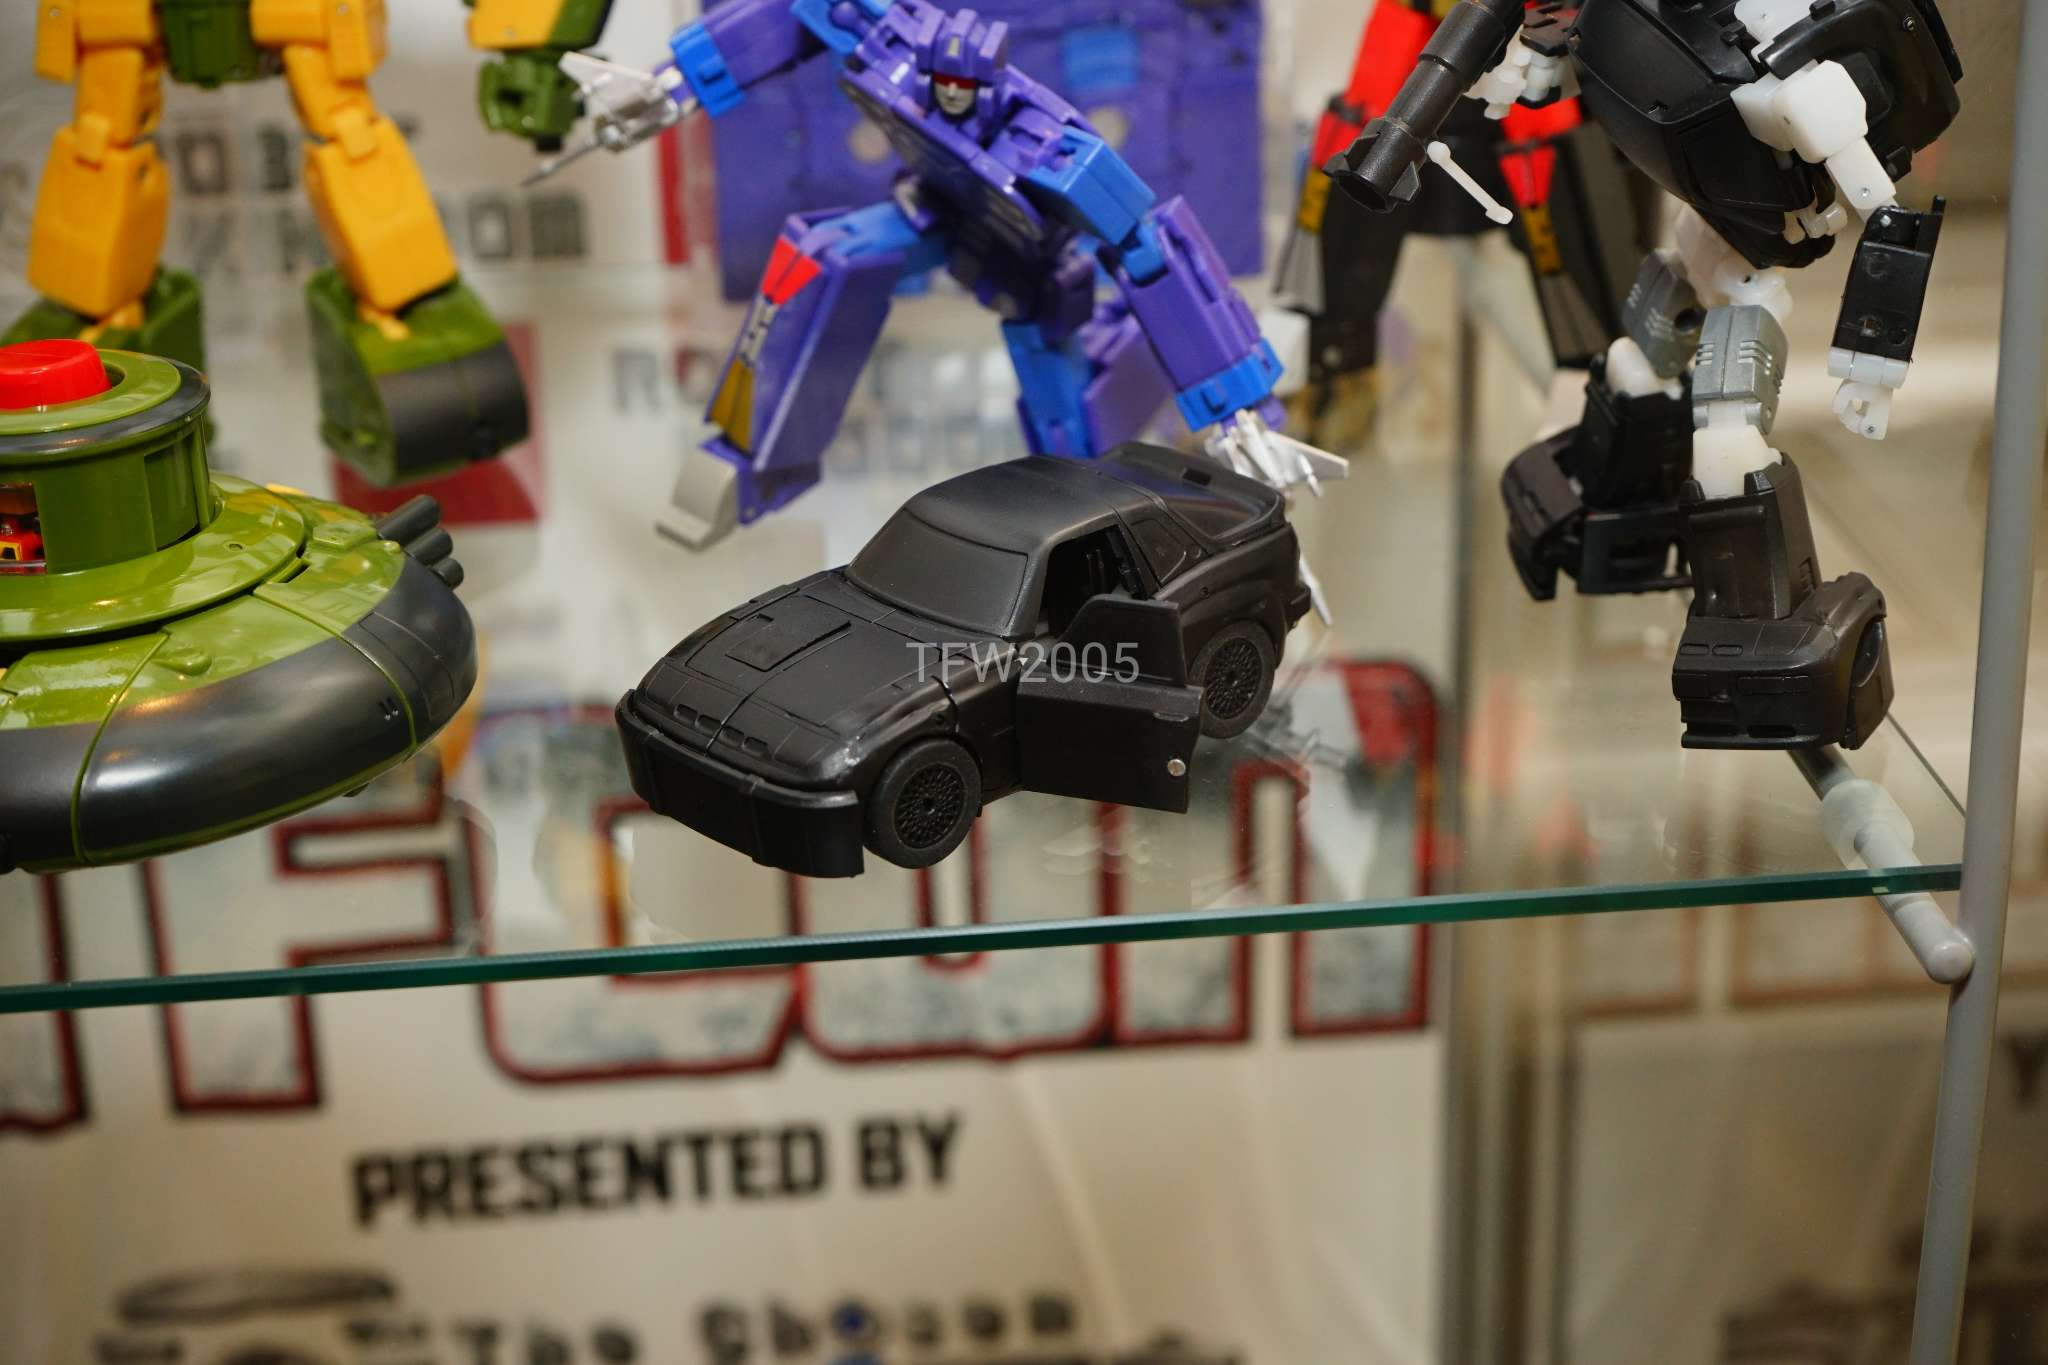 [Ocular Max] Produit Tiers - Minibots MP - PS-09 Hellion (aka Cliffjumper/Matamore), PS-11 Omne - (aka Cosmos) MNXbKIQV_o